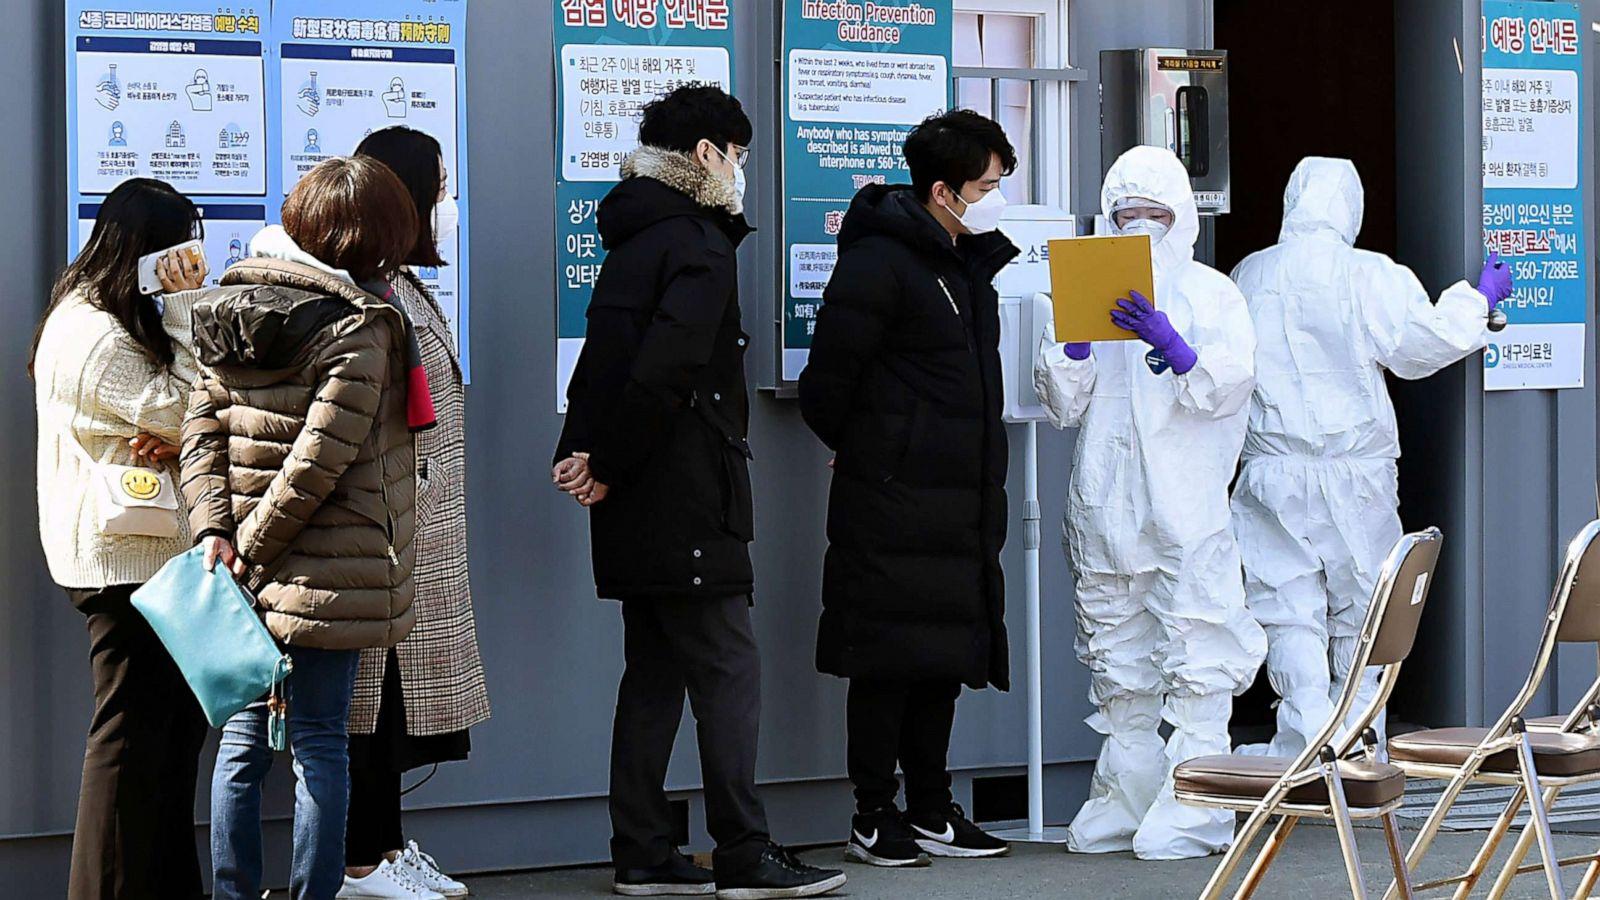 Coronavirus cases in South Korea up to 433 overnight - ABC News